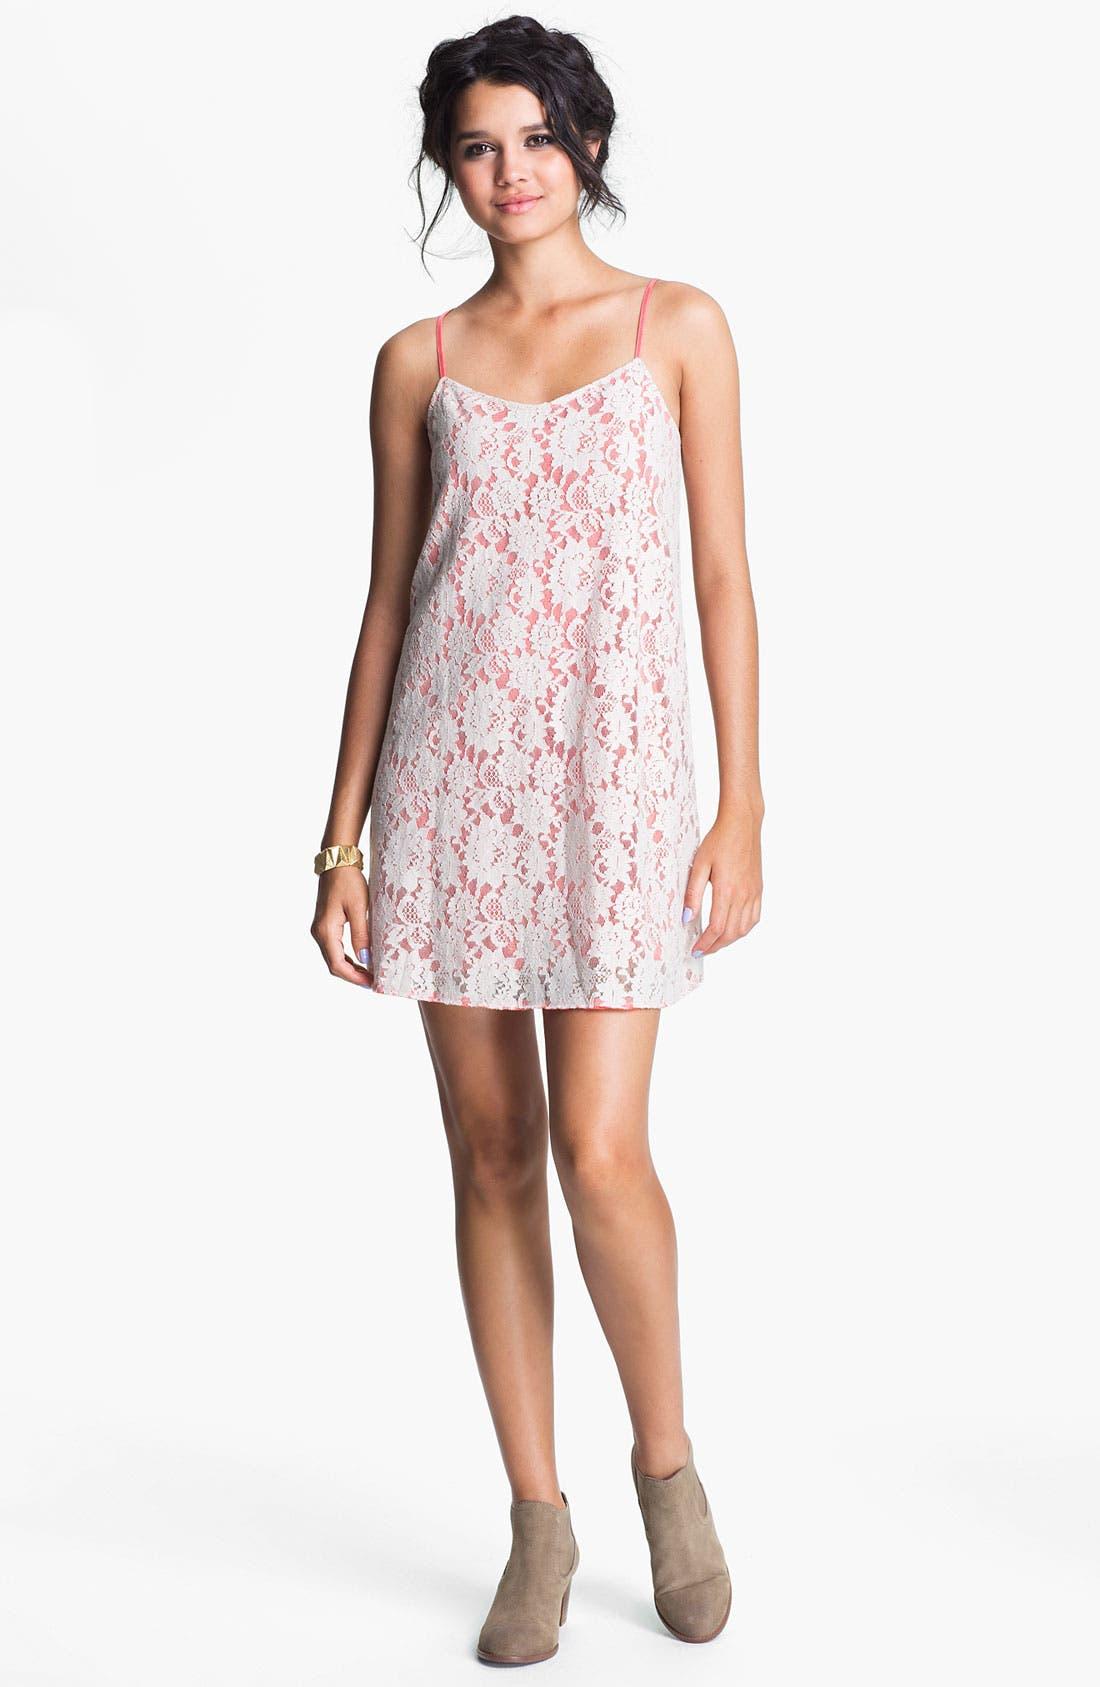 Alternate Image 1 Selected - Frenchi® 'Fairytale' Lace Slip Dress (Juniors)